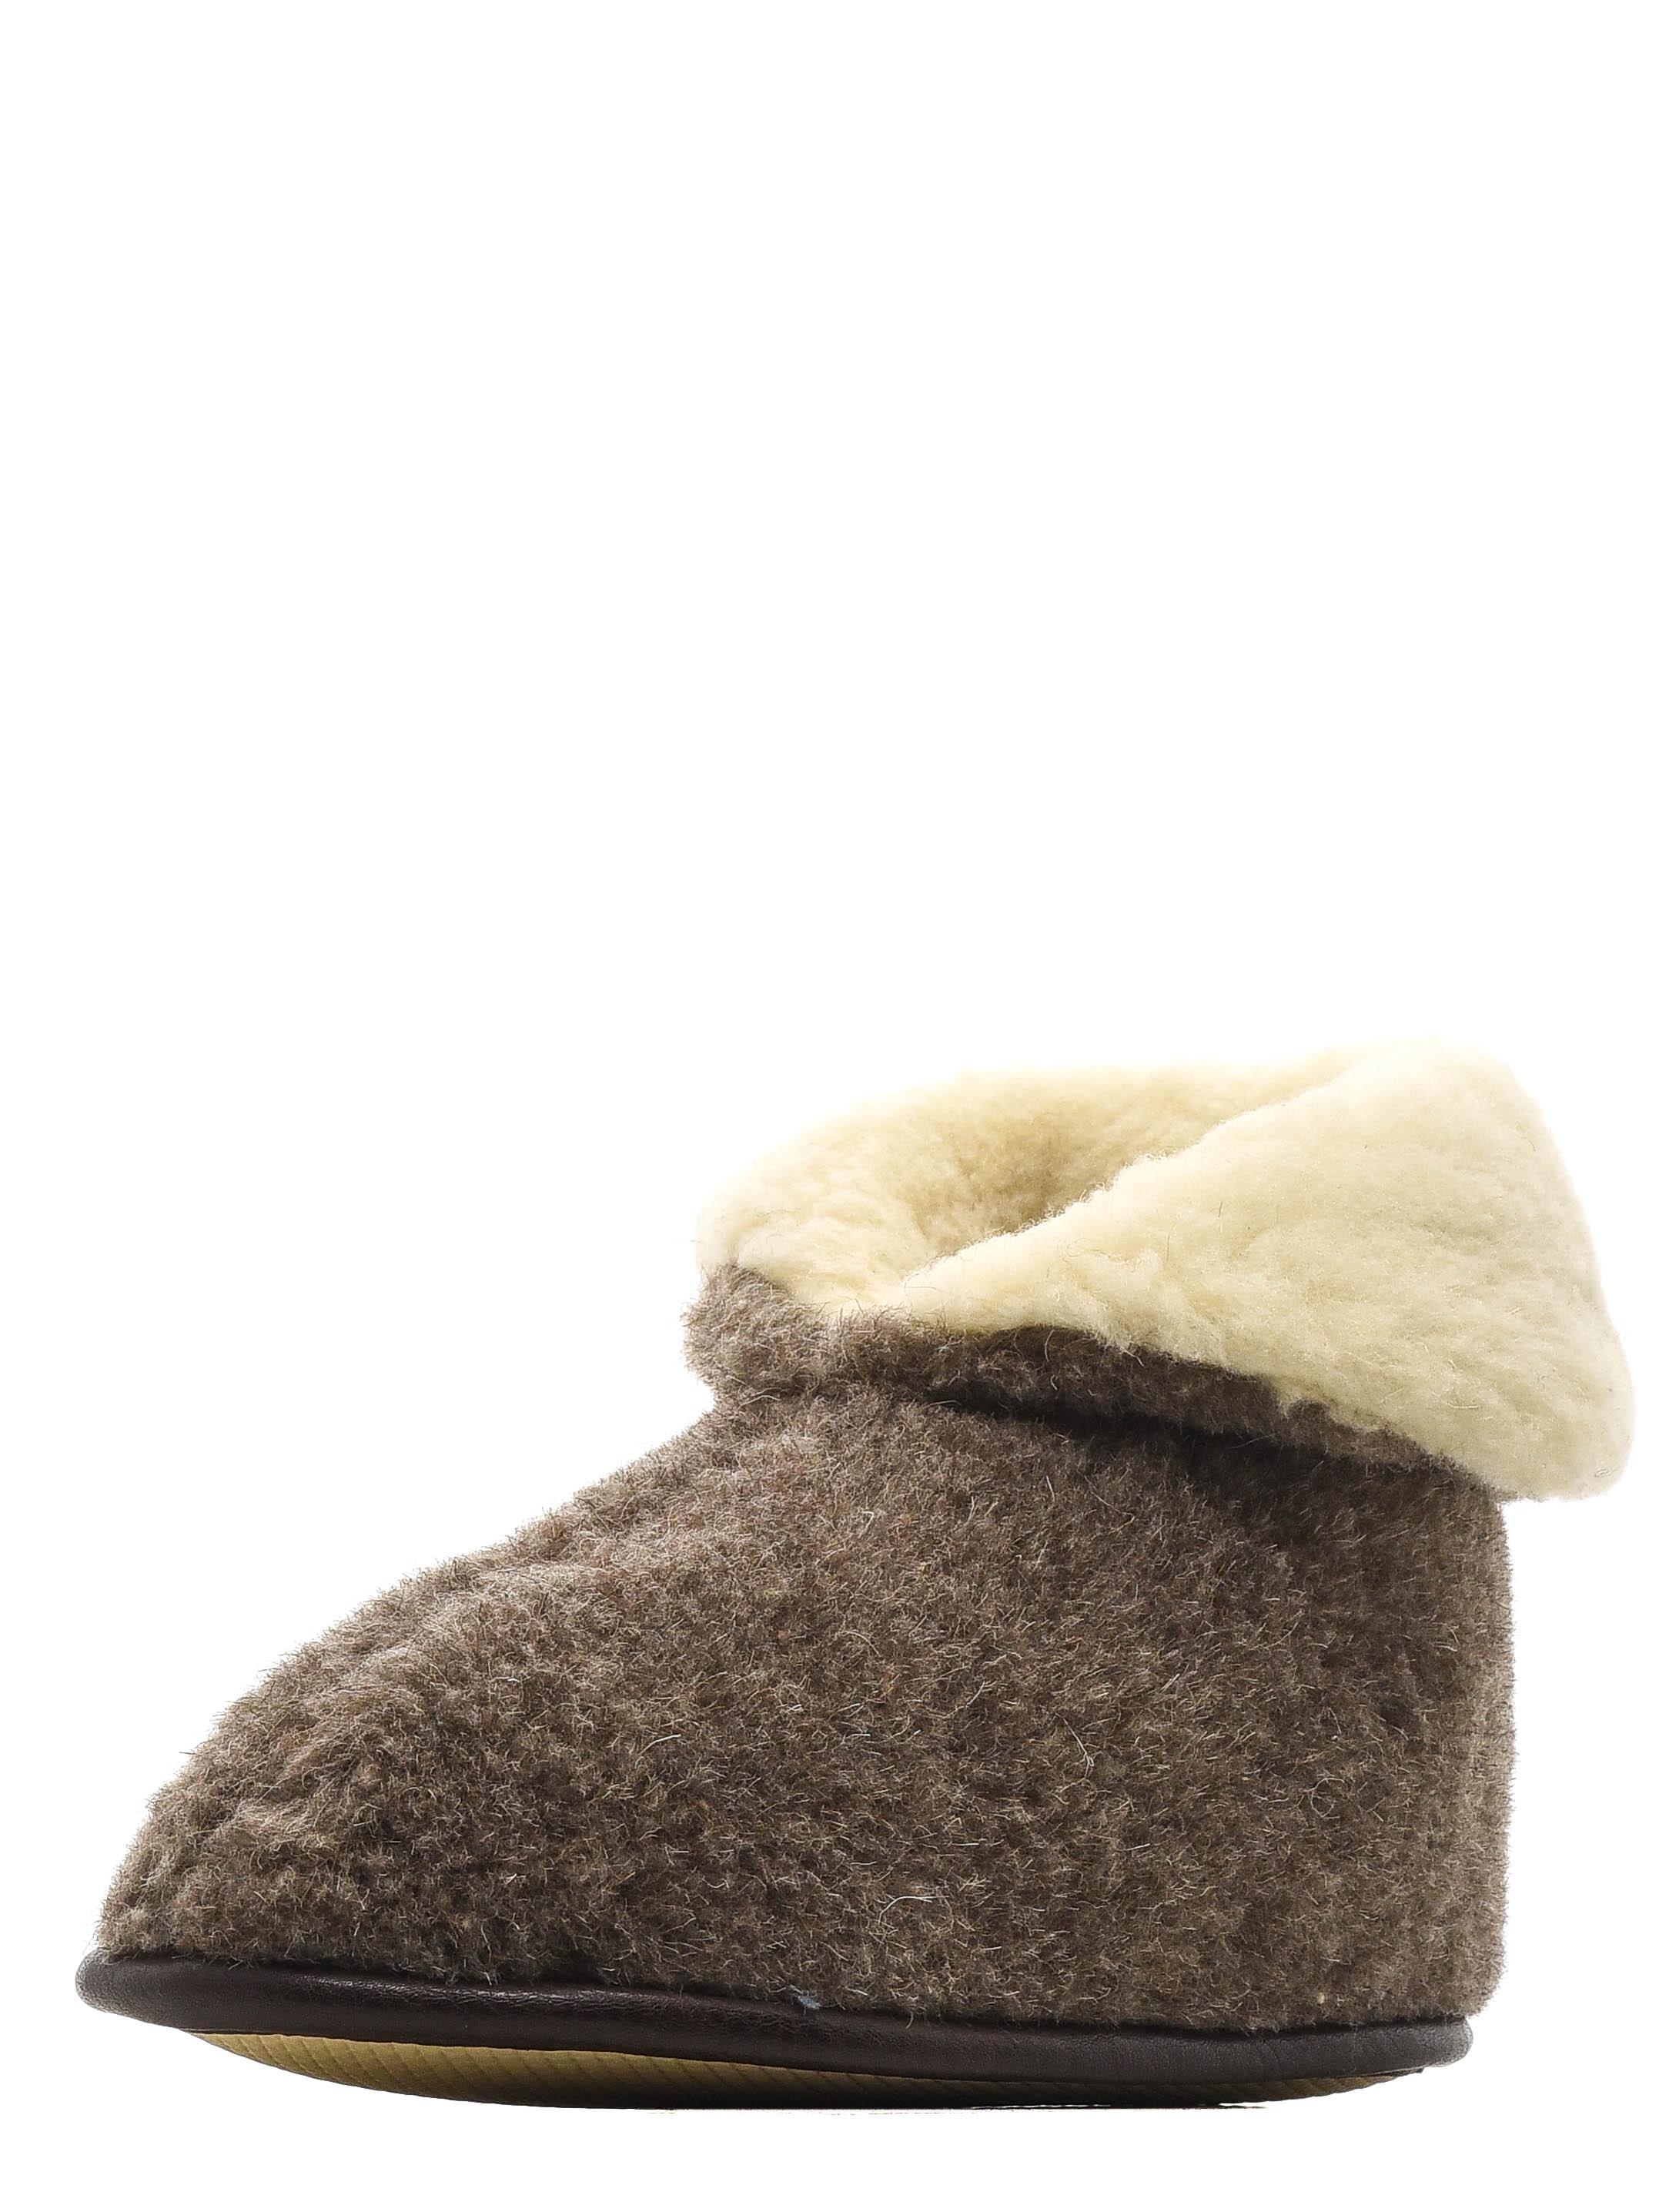 Тапочки из 100% овечьей шерсти табак Collar Long